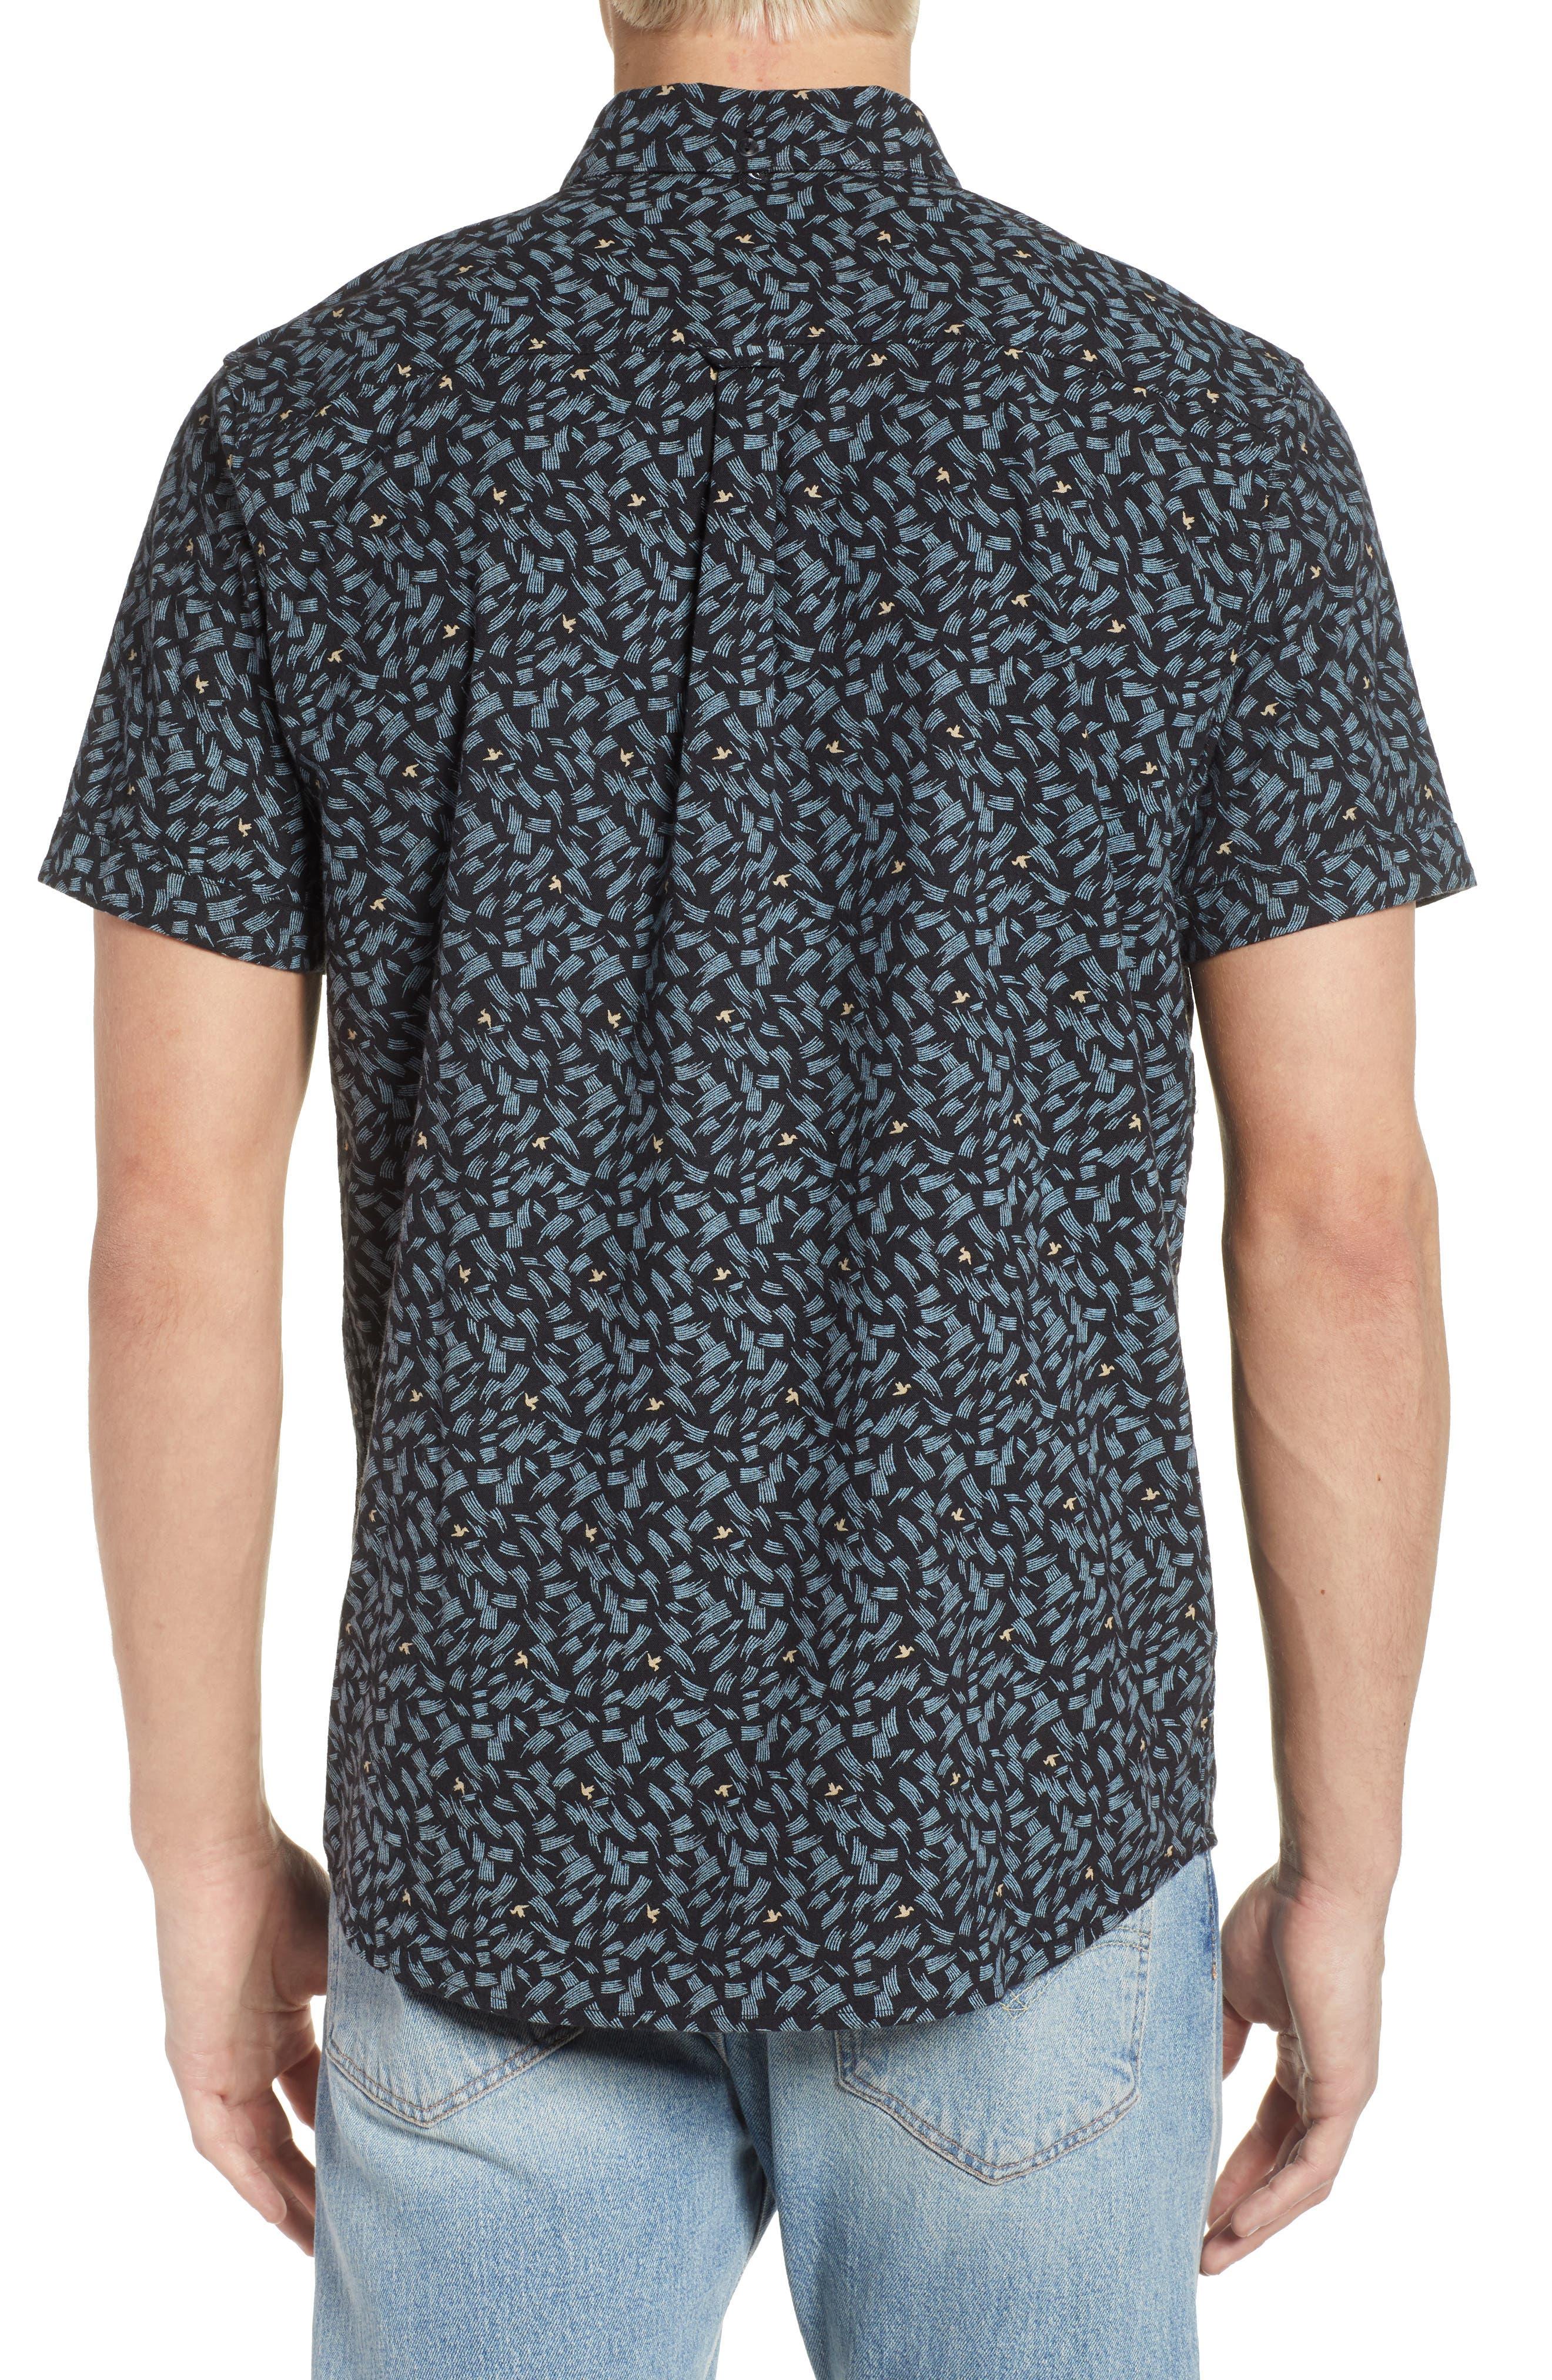 Northern Short Sleeve Shirt,                             Alternate thumbnail 2, color,                             001